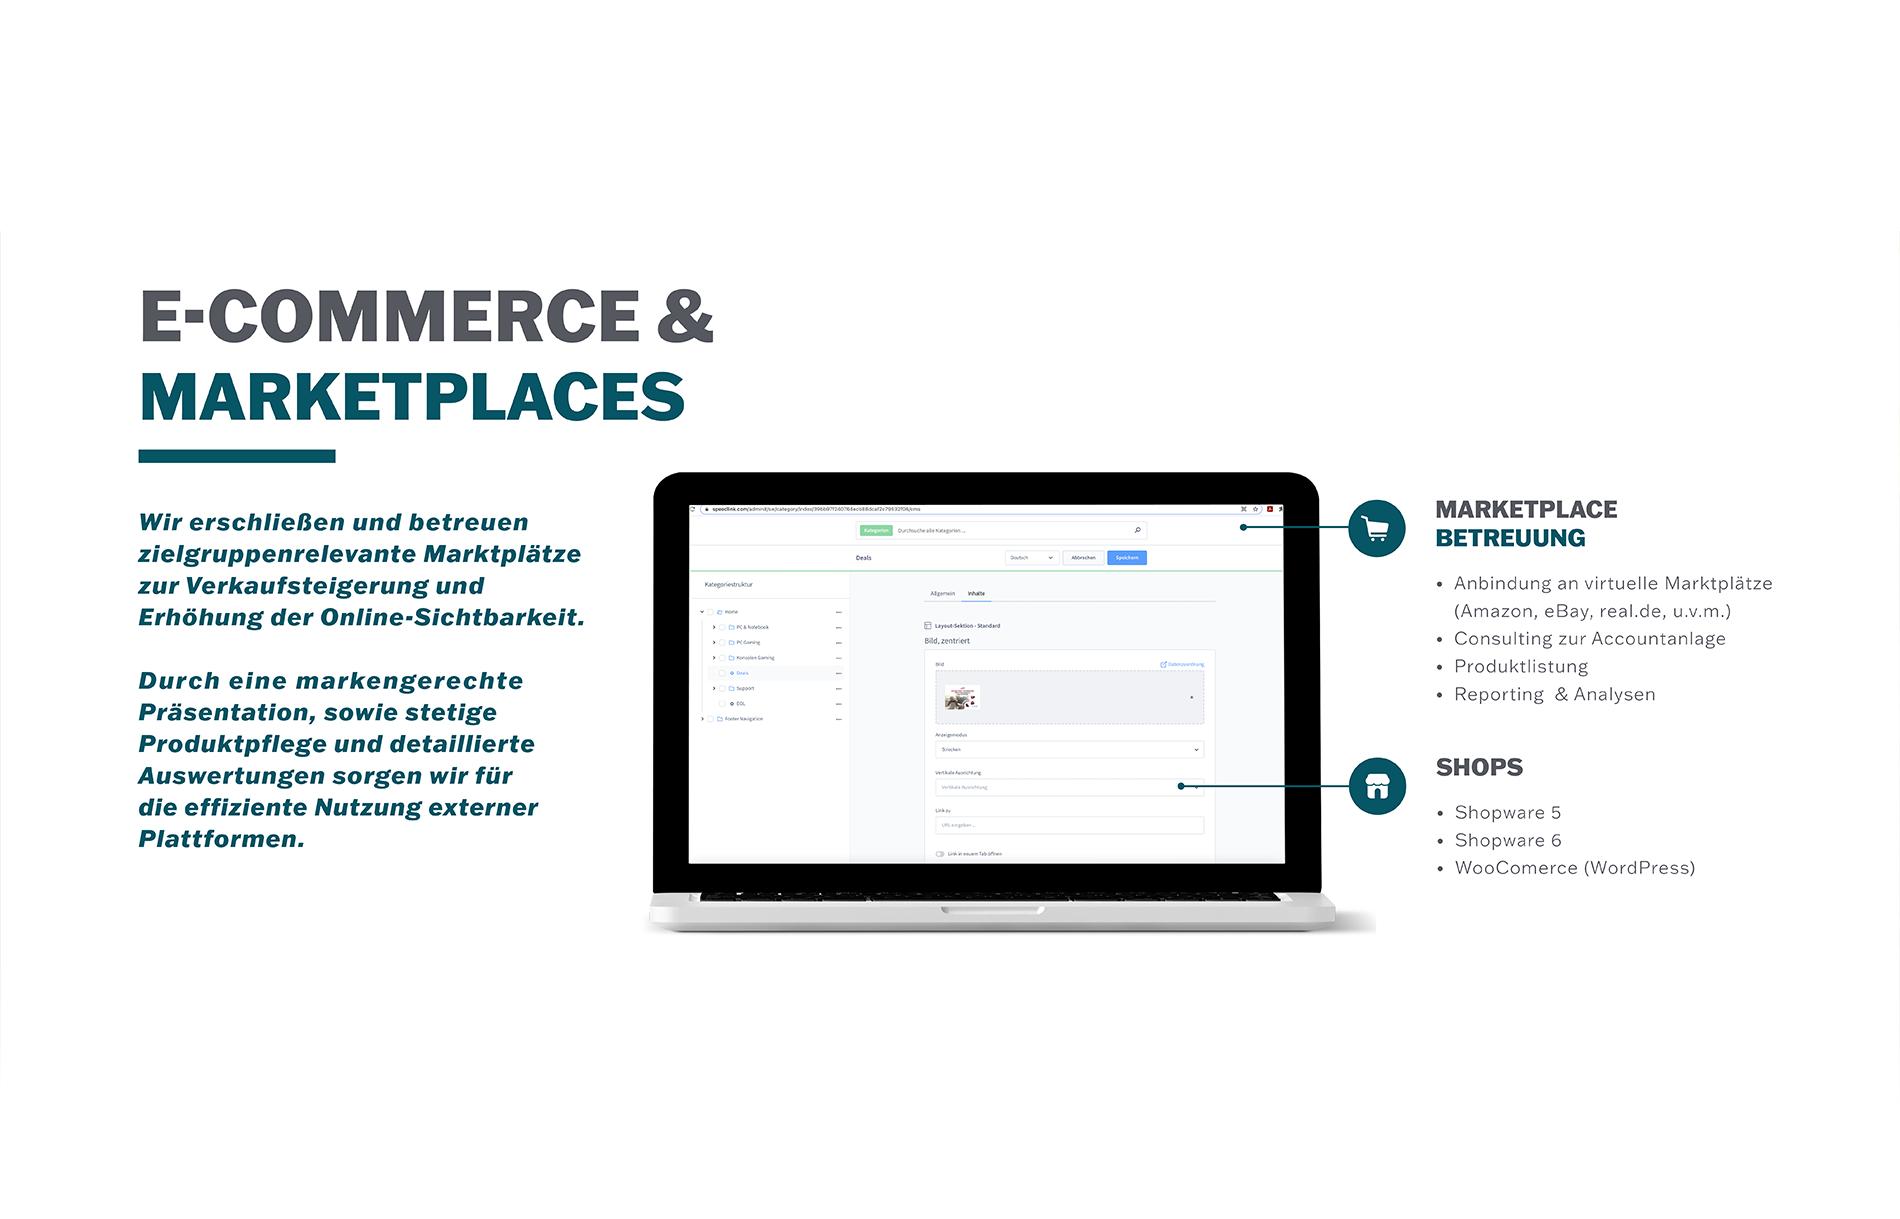 210507_coconad_Kompetenzen_E-Commerce_02_Text